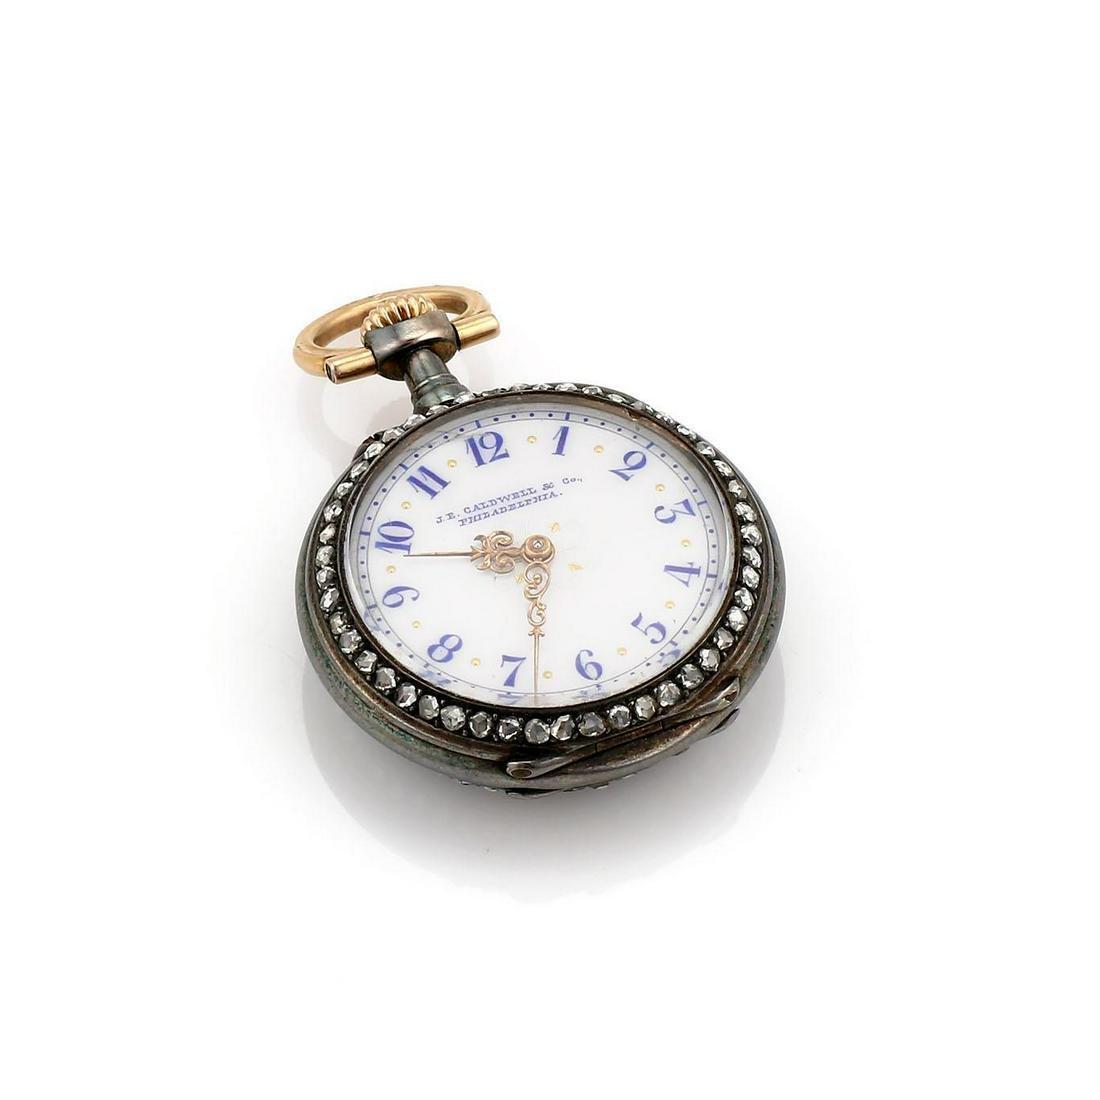 Vacheron Constantin J E Caldwell Enamel Pocket Watch